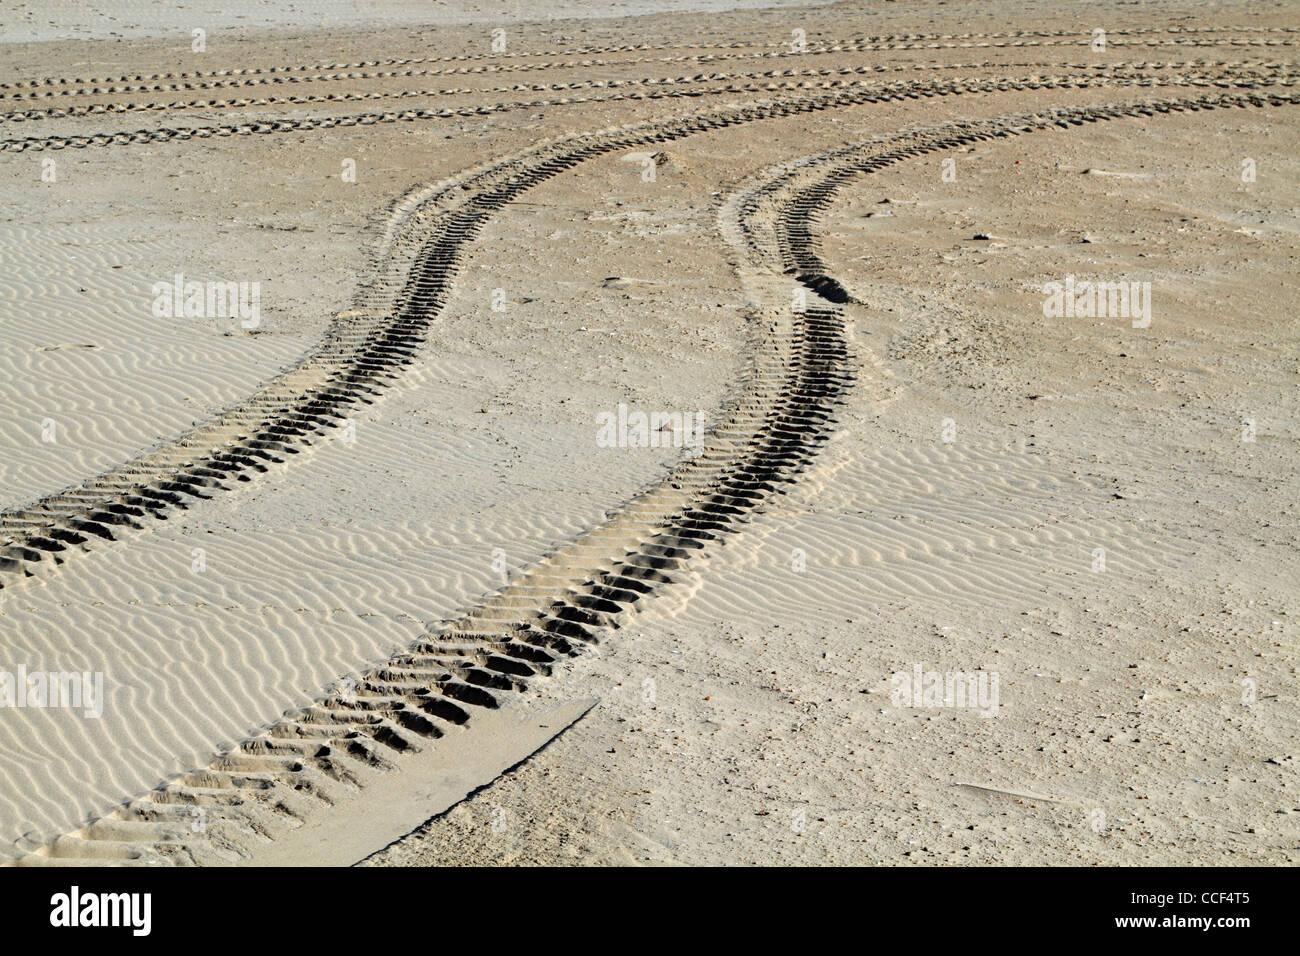 Tire tracks on the beach. Virginia Beach, VA, USA - Stock Image